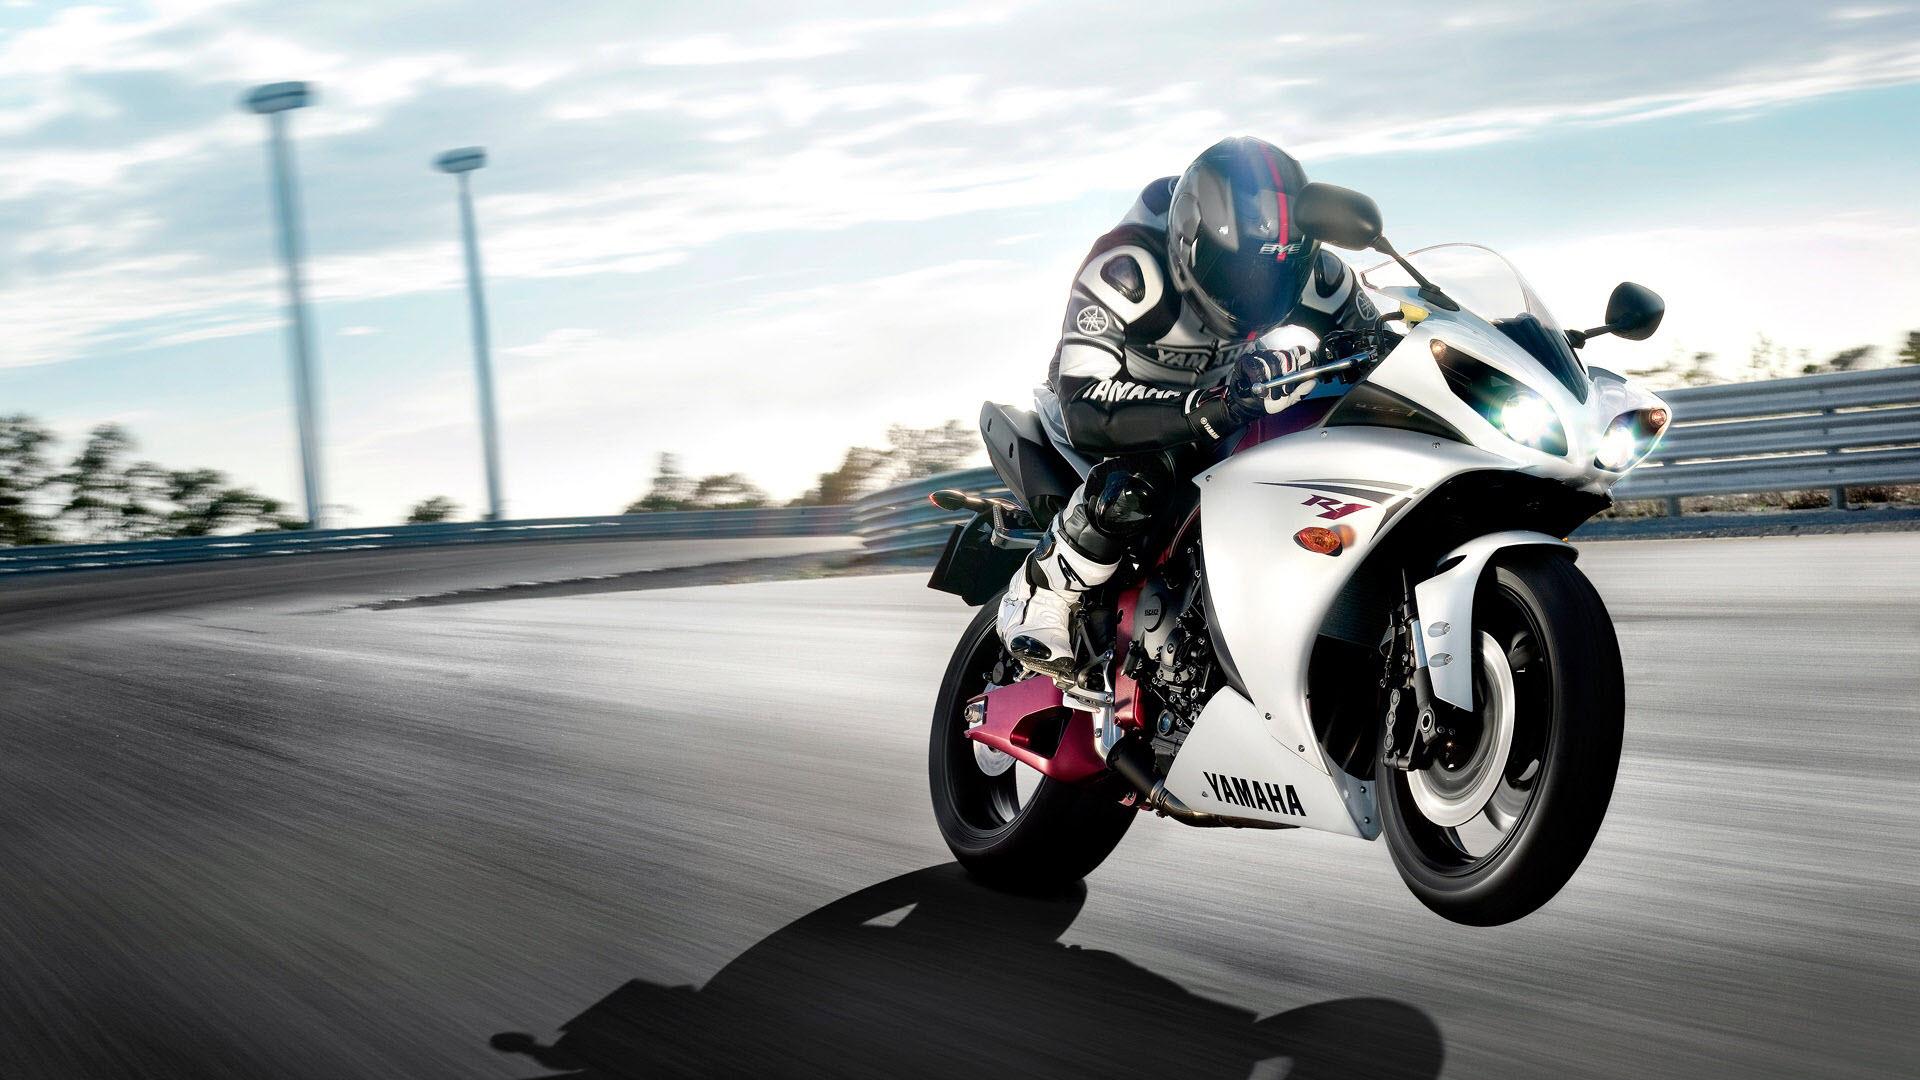 Motorcycle Wallpapers · Motorcycle Wallpapers ...